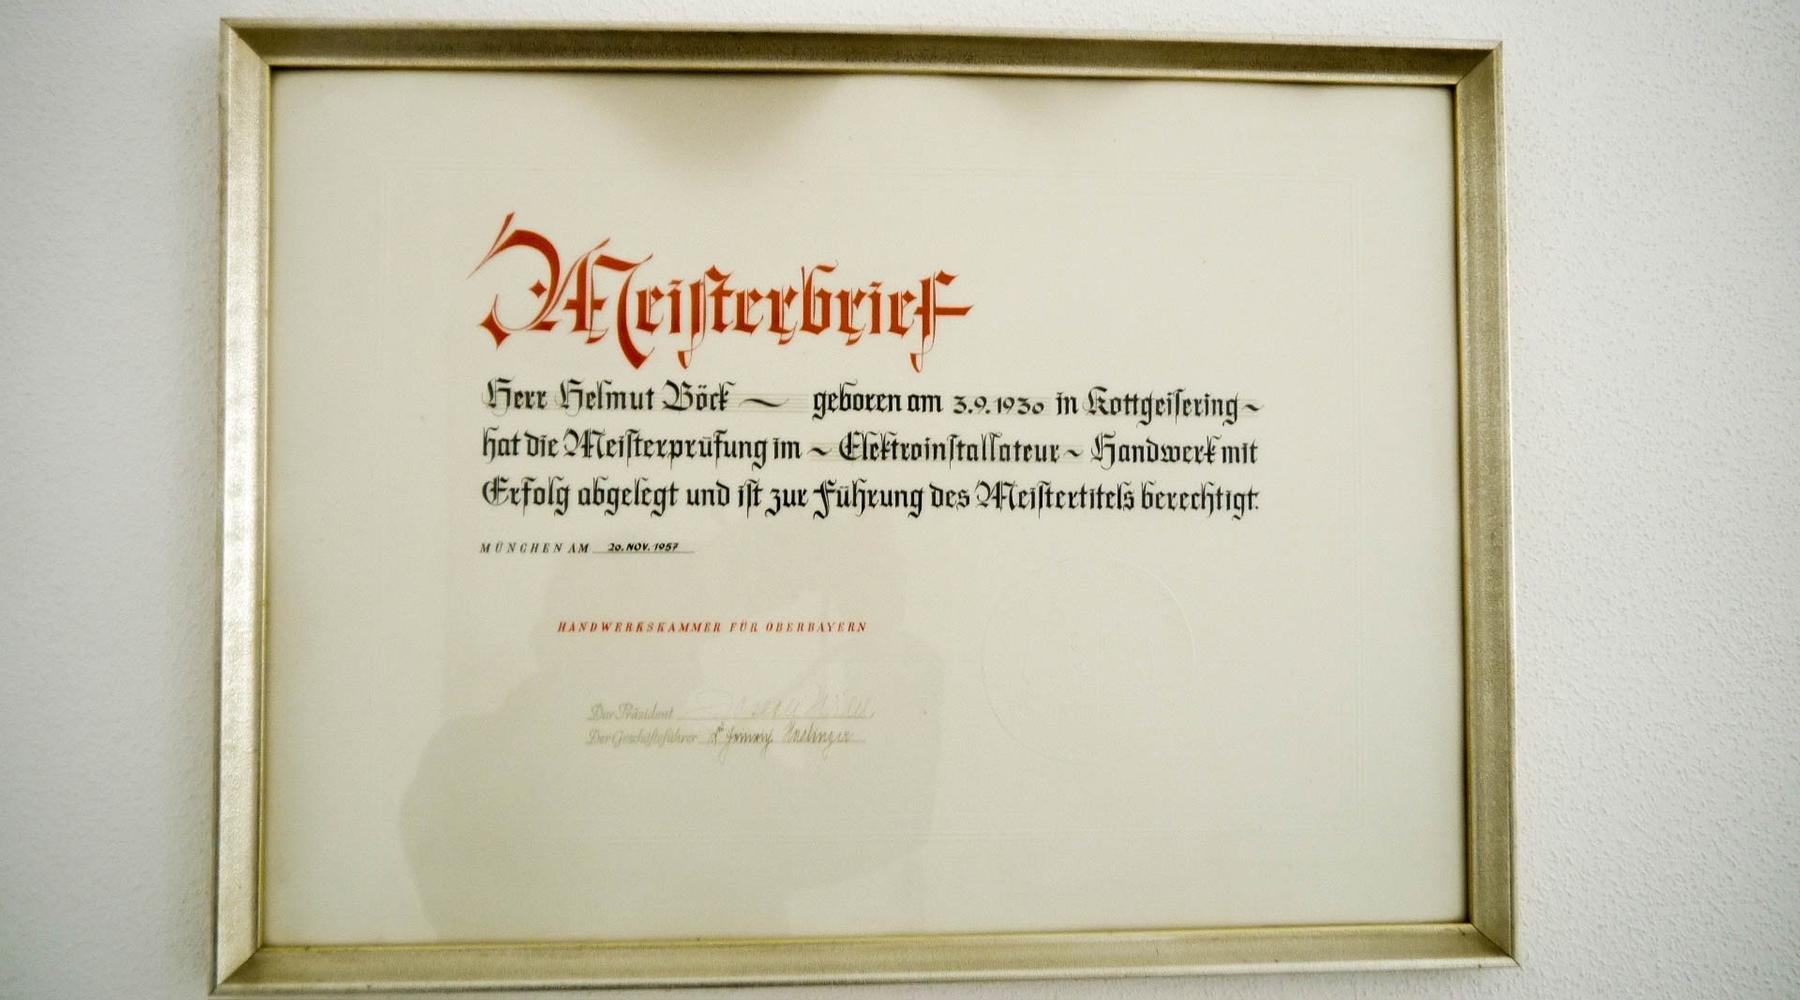 Meisterbrief als Elektriker Helmut Böck